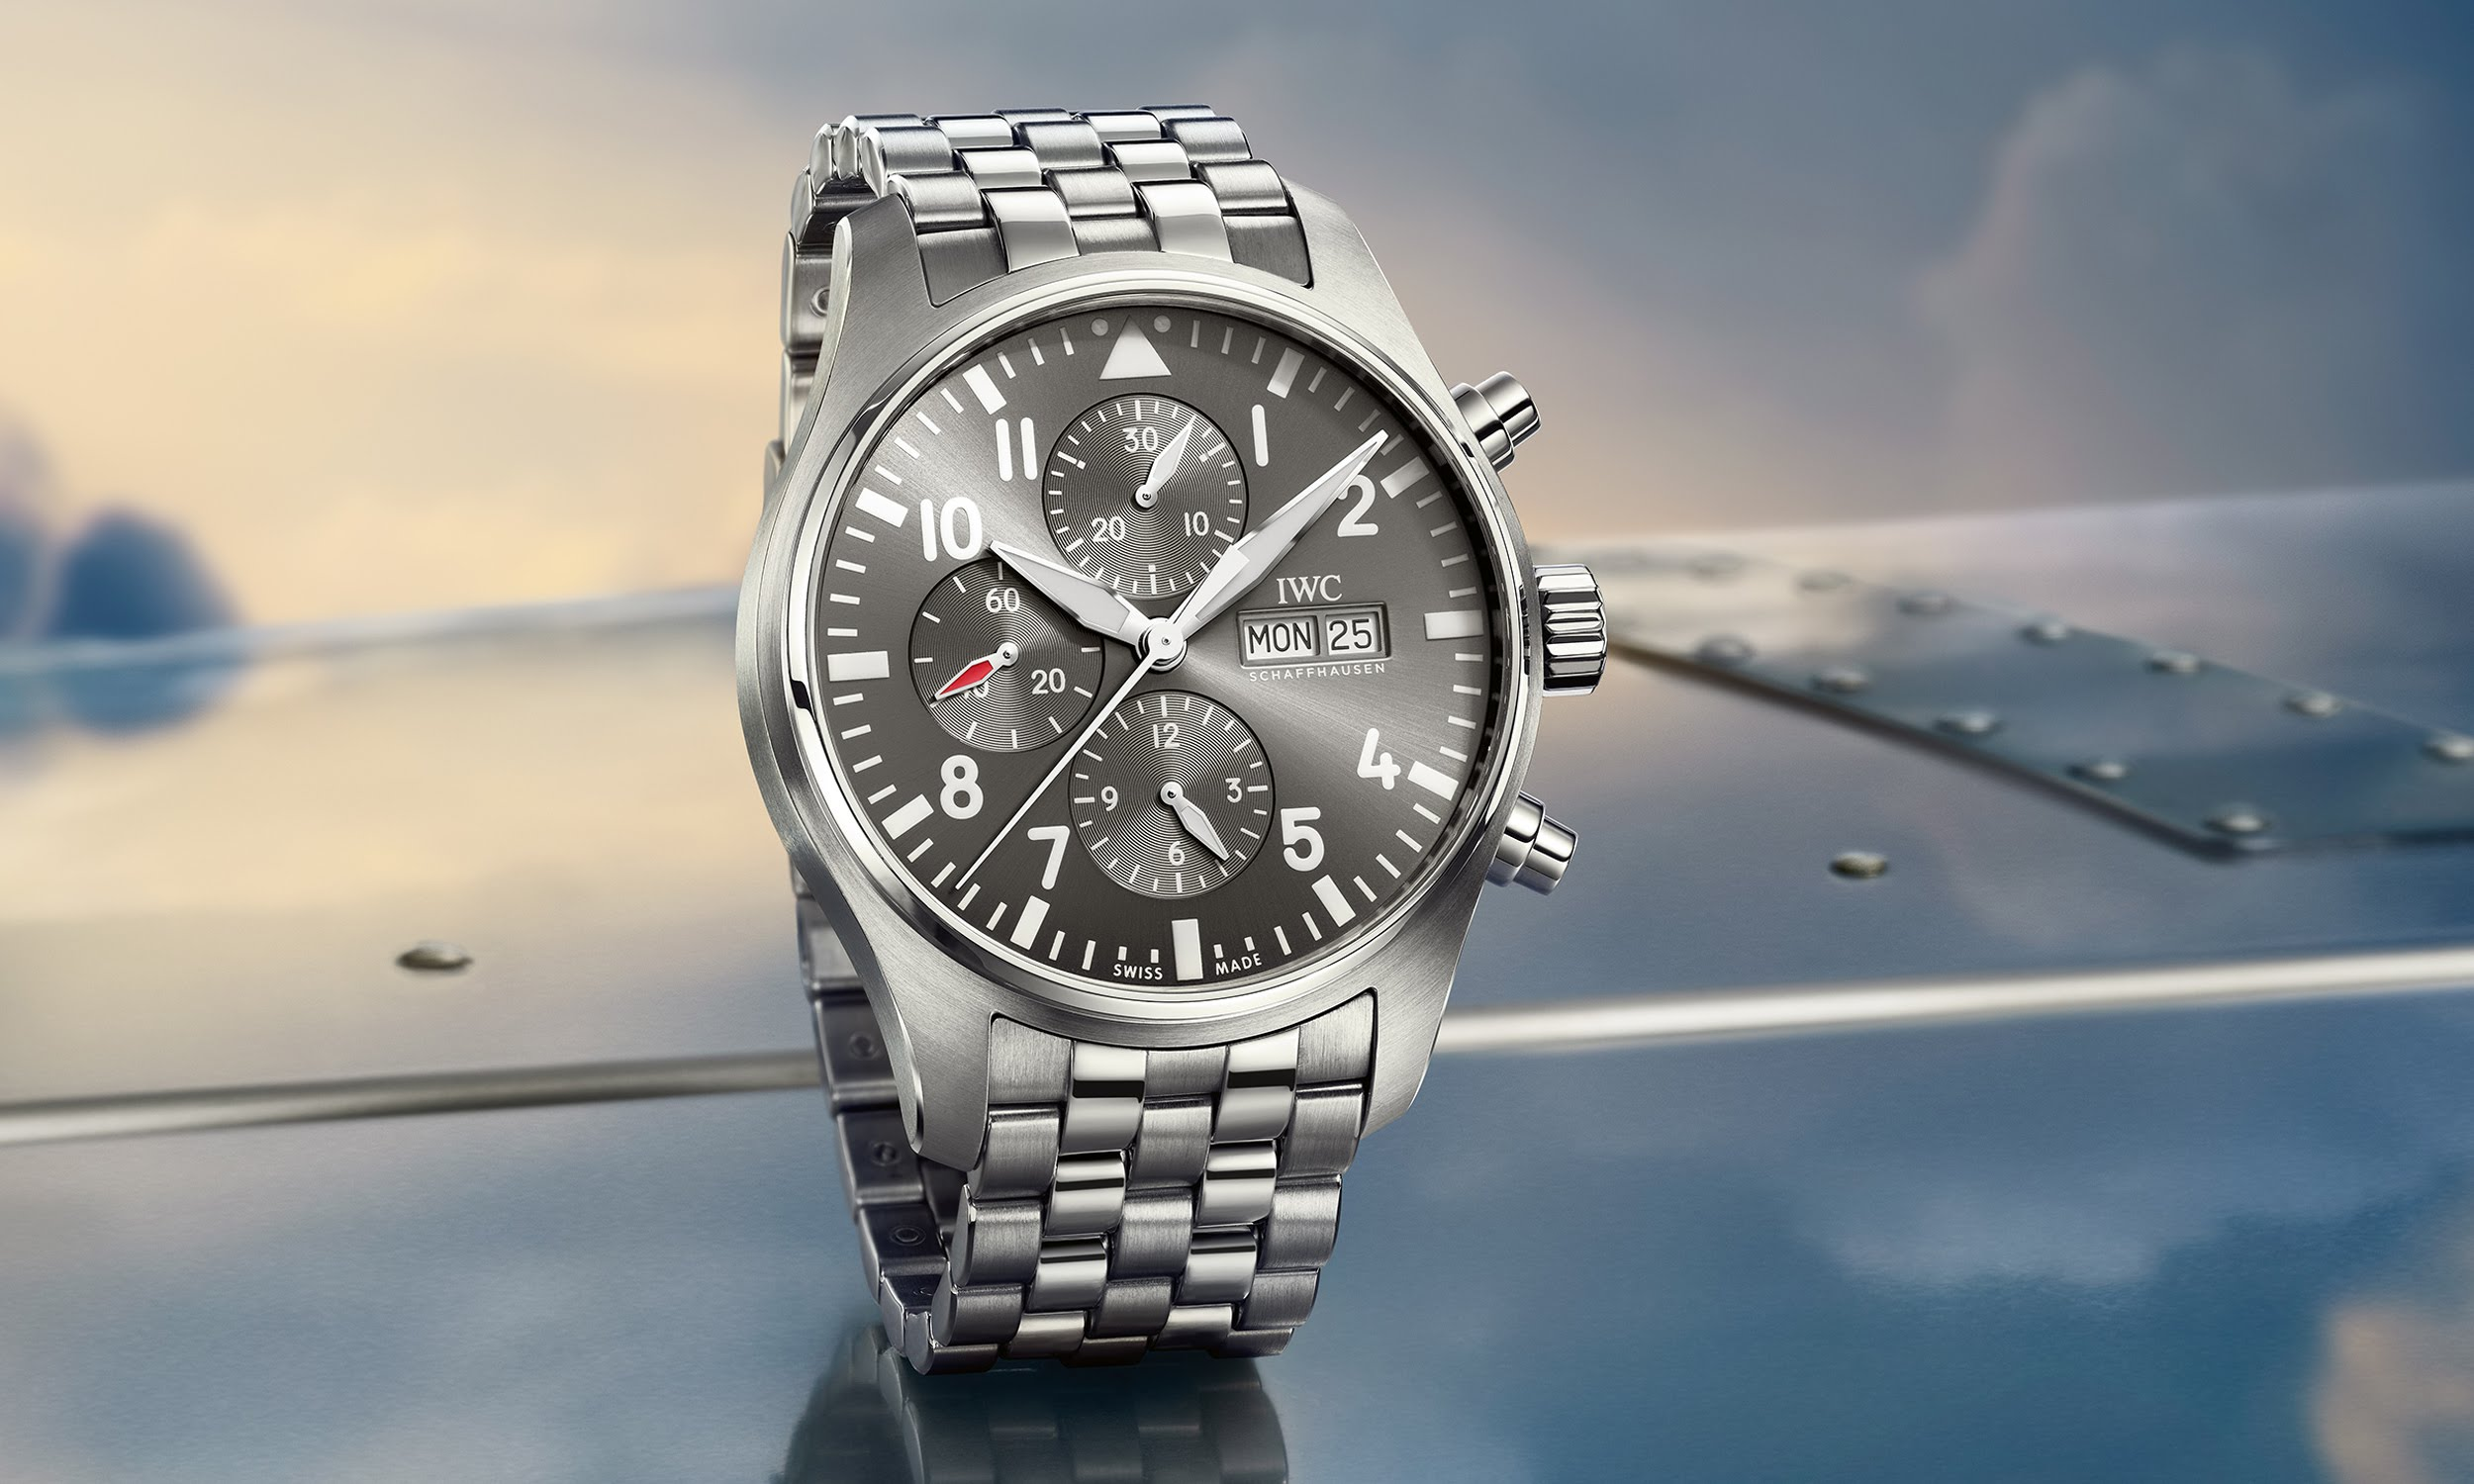 IWC Pilot's watch chronograph spitfire replica3